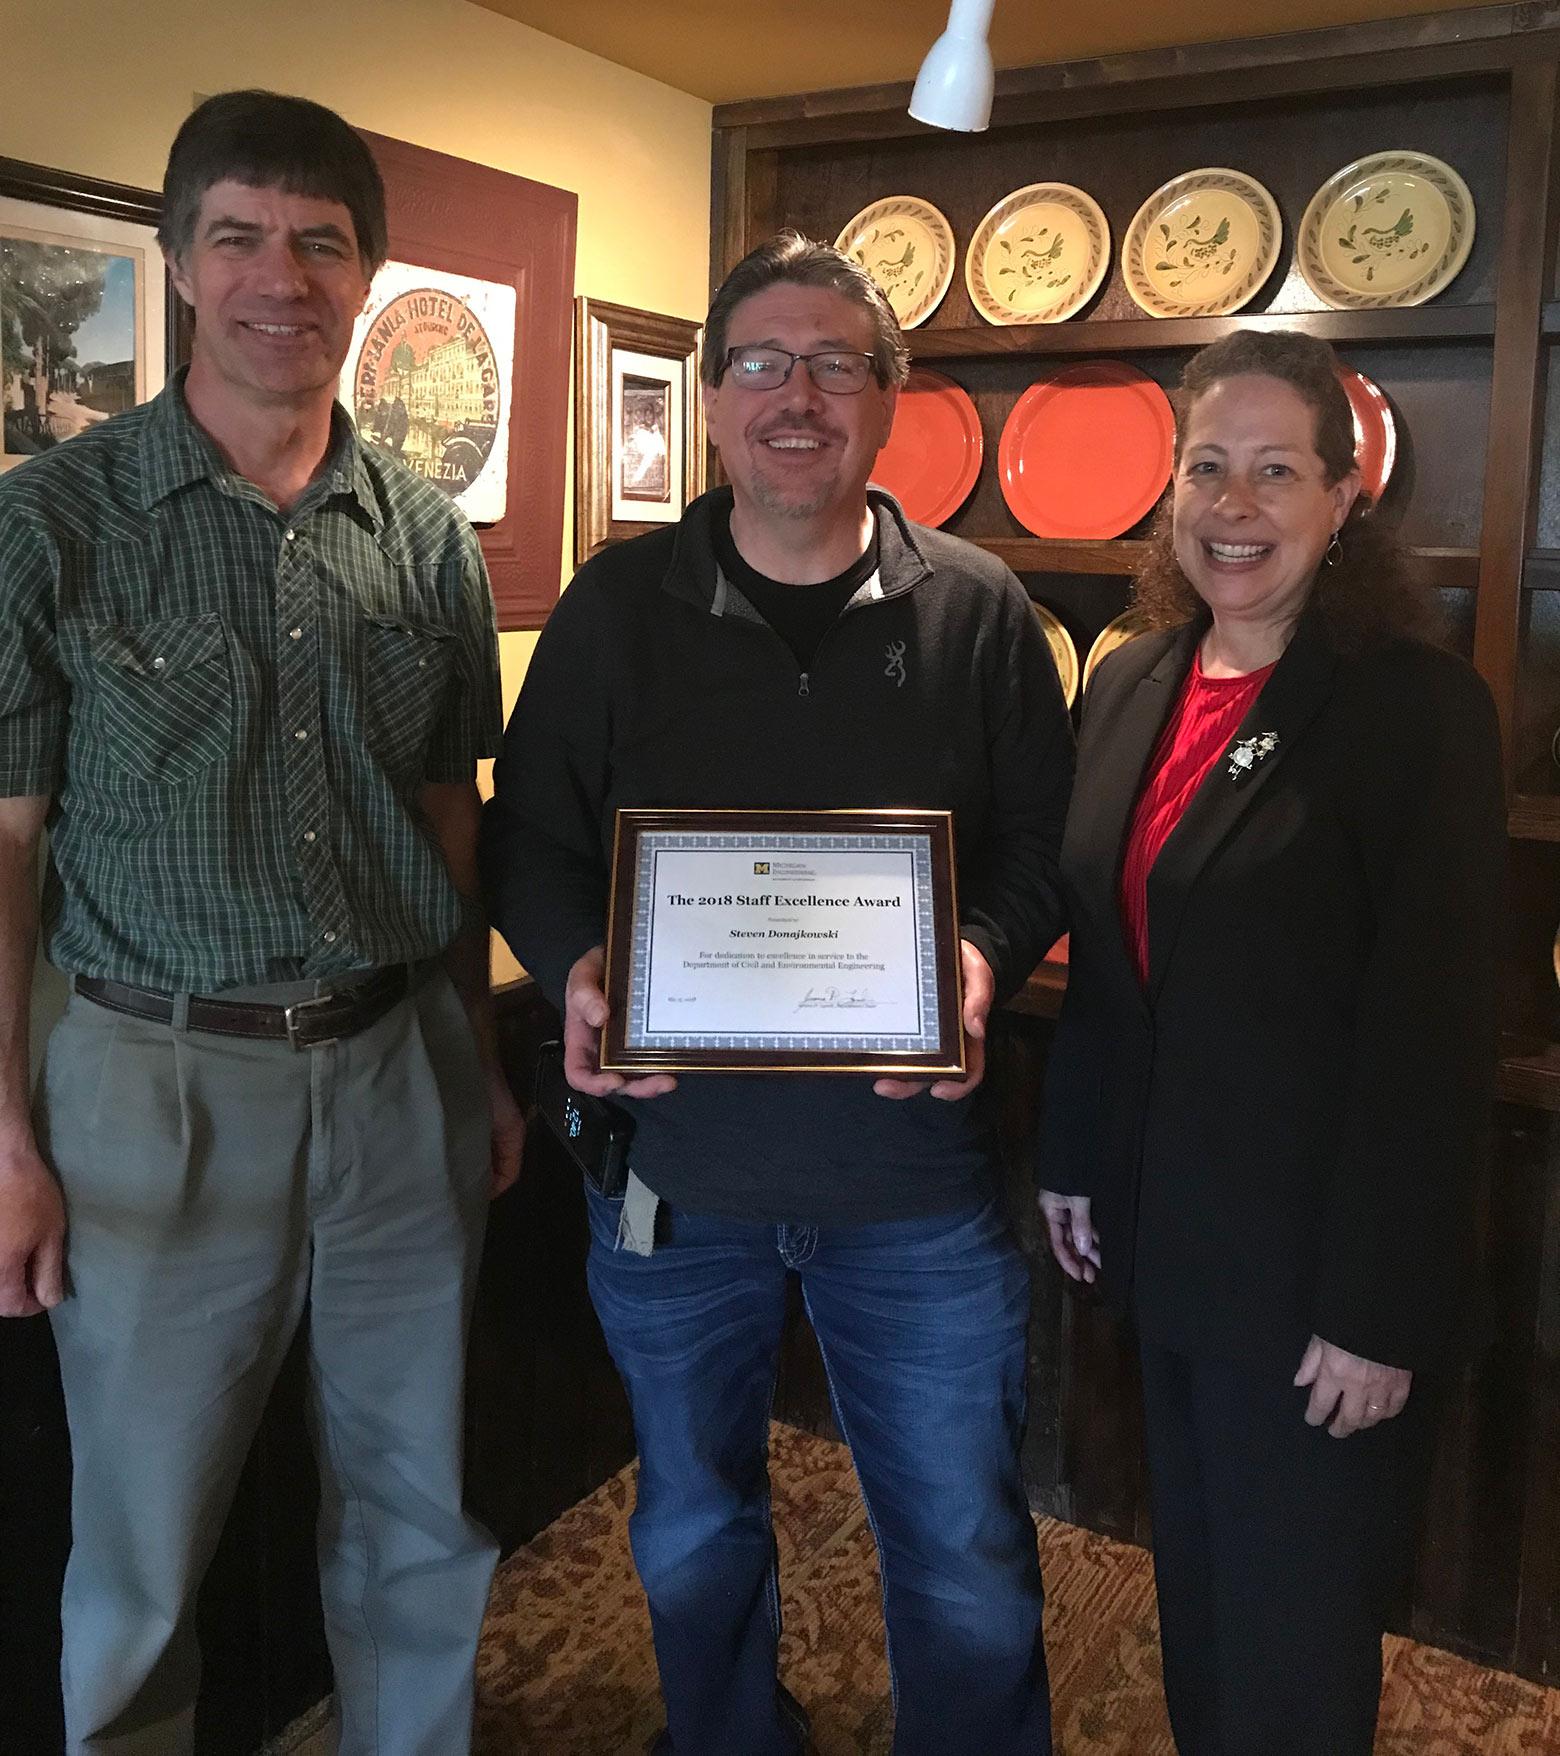 Steve Donajkowski Staff Excellence Award